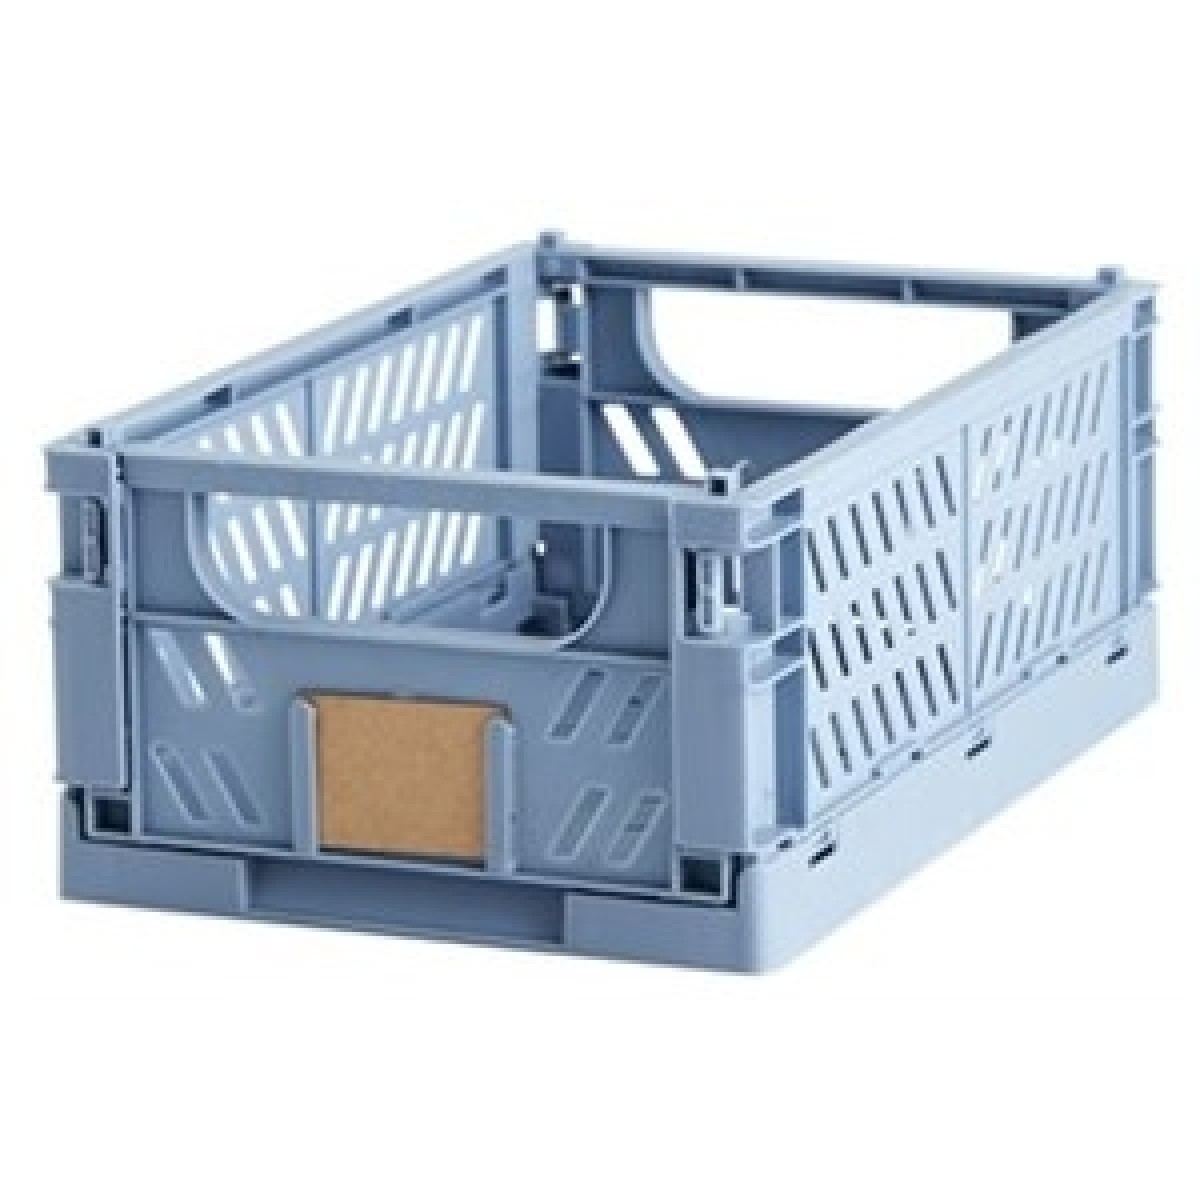 DAY Opbevaringskasse foldbar 33 x 24,5 x 15 cm lys blå